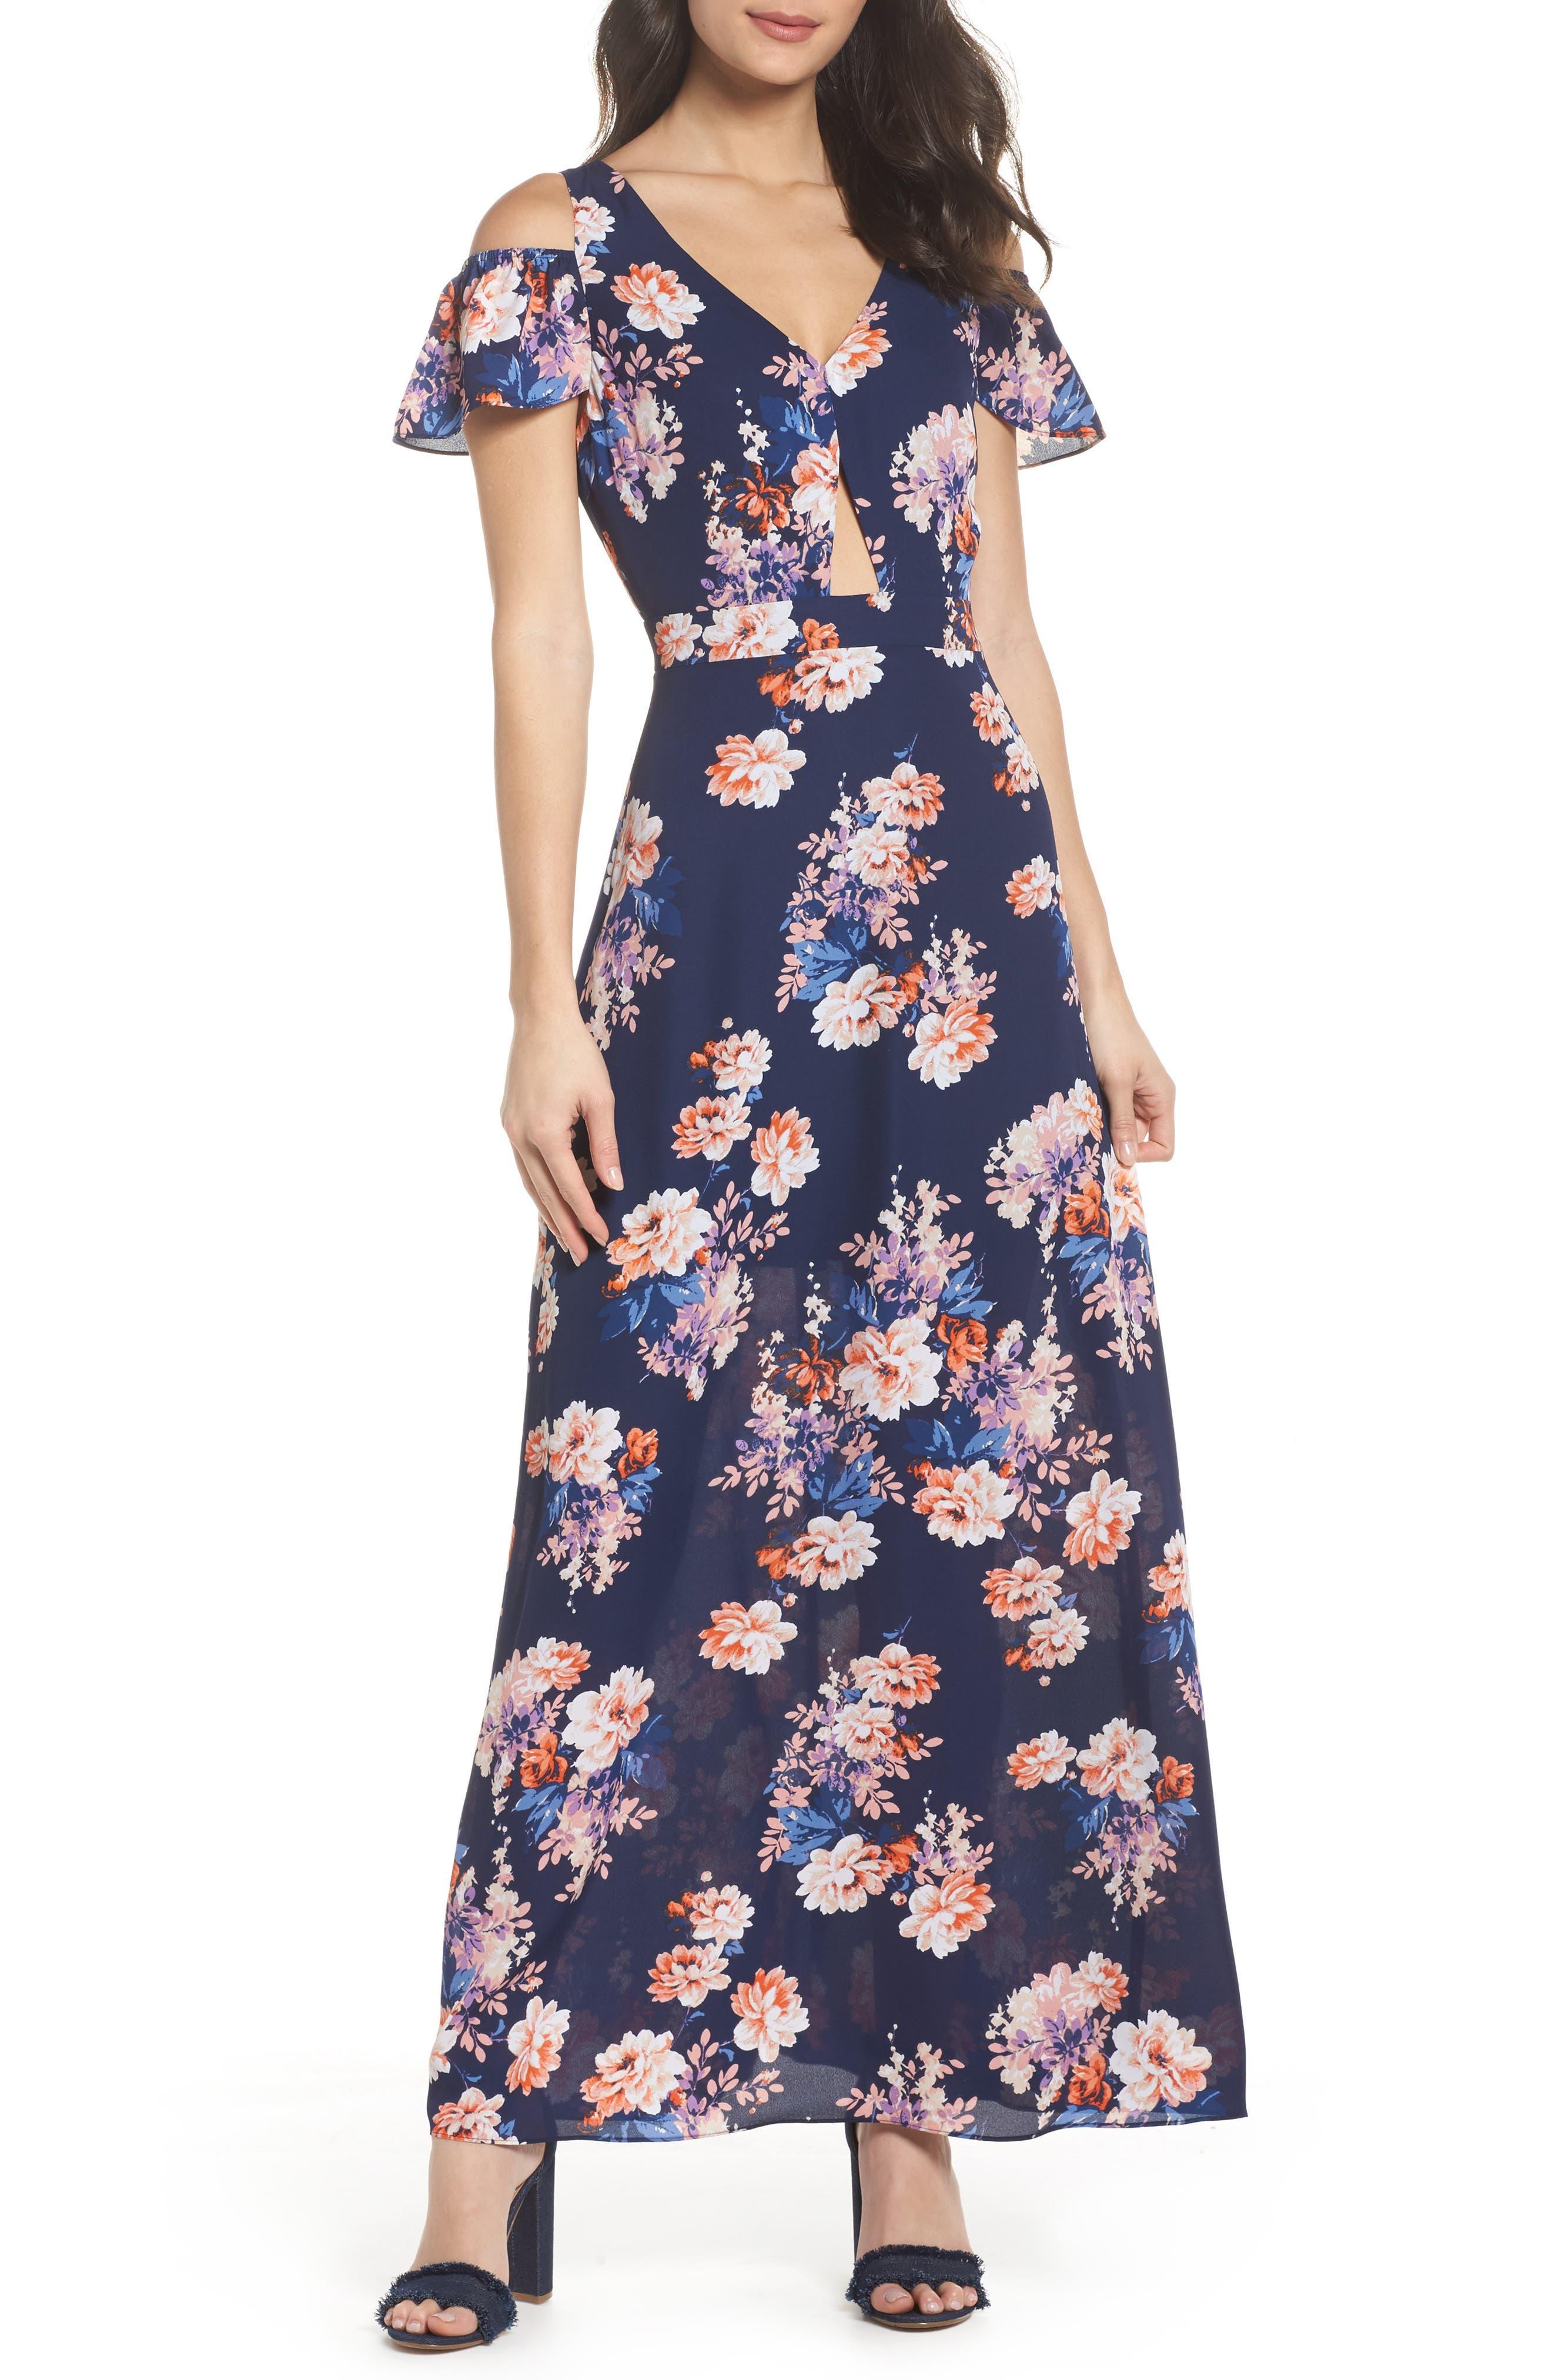 Chasing Butterflies Maxi Dress,                             Main thumbnail 1, color,